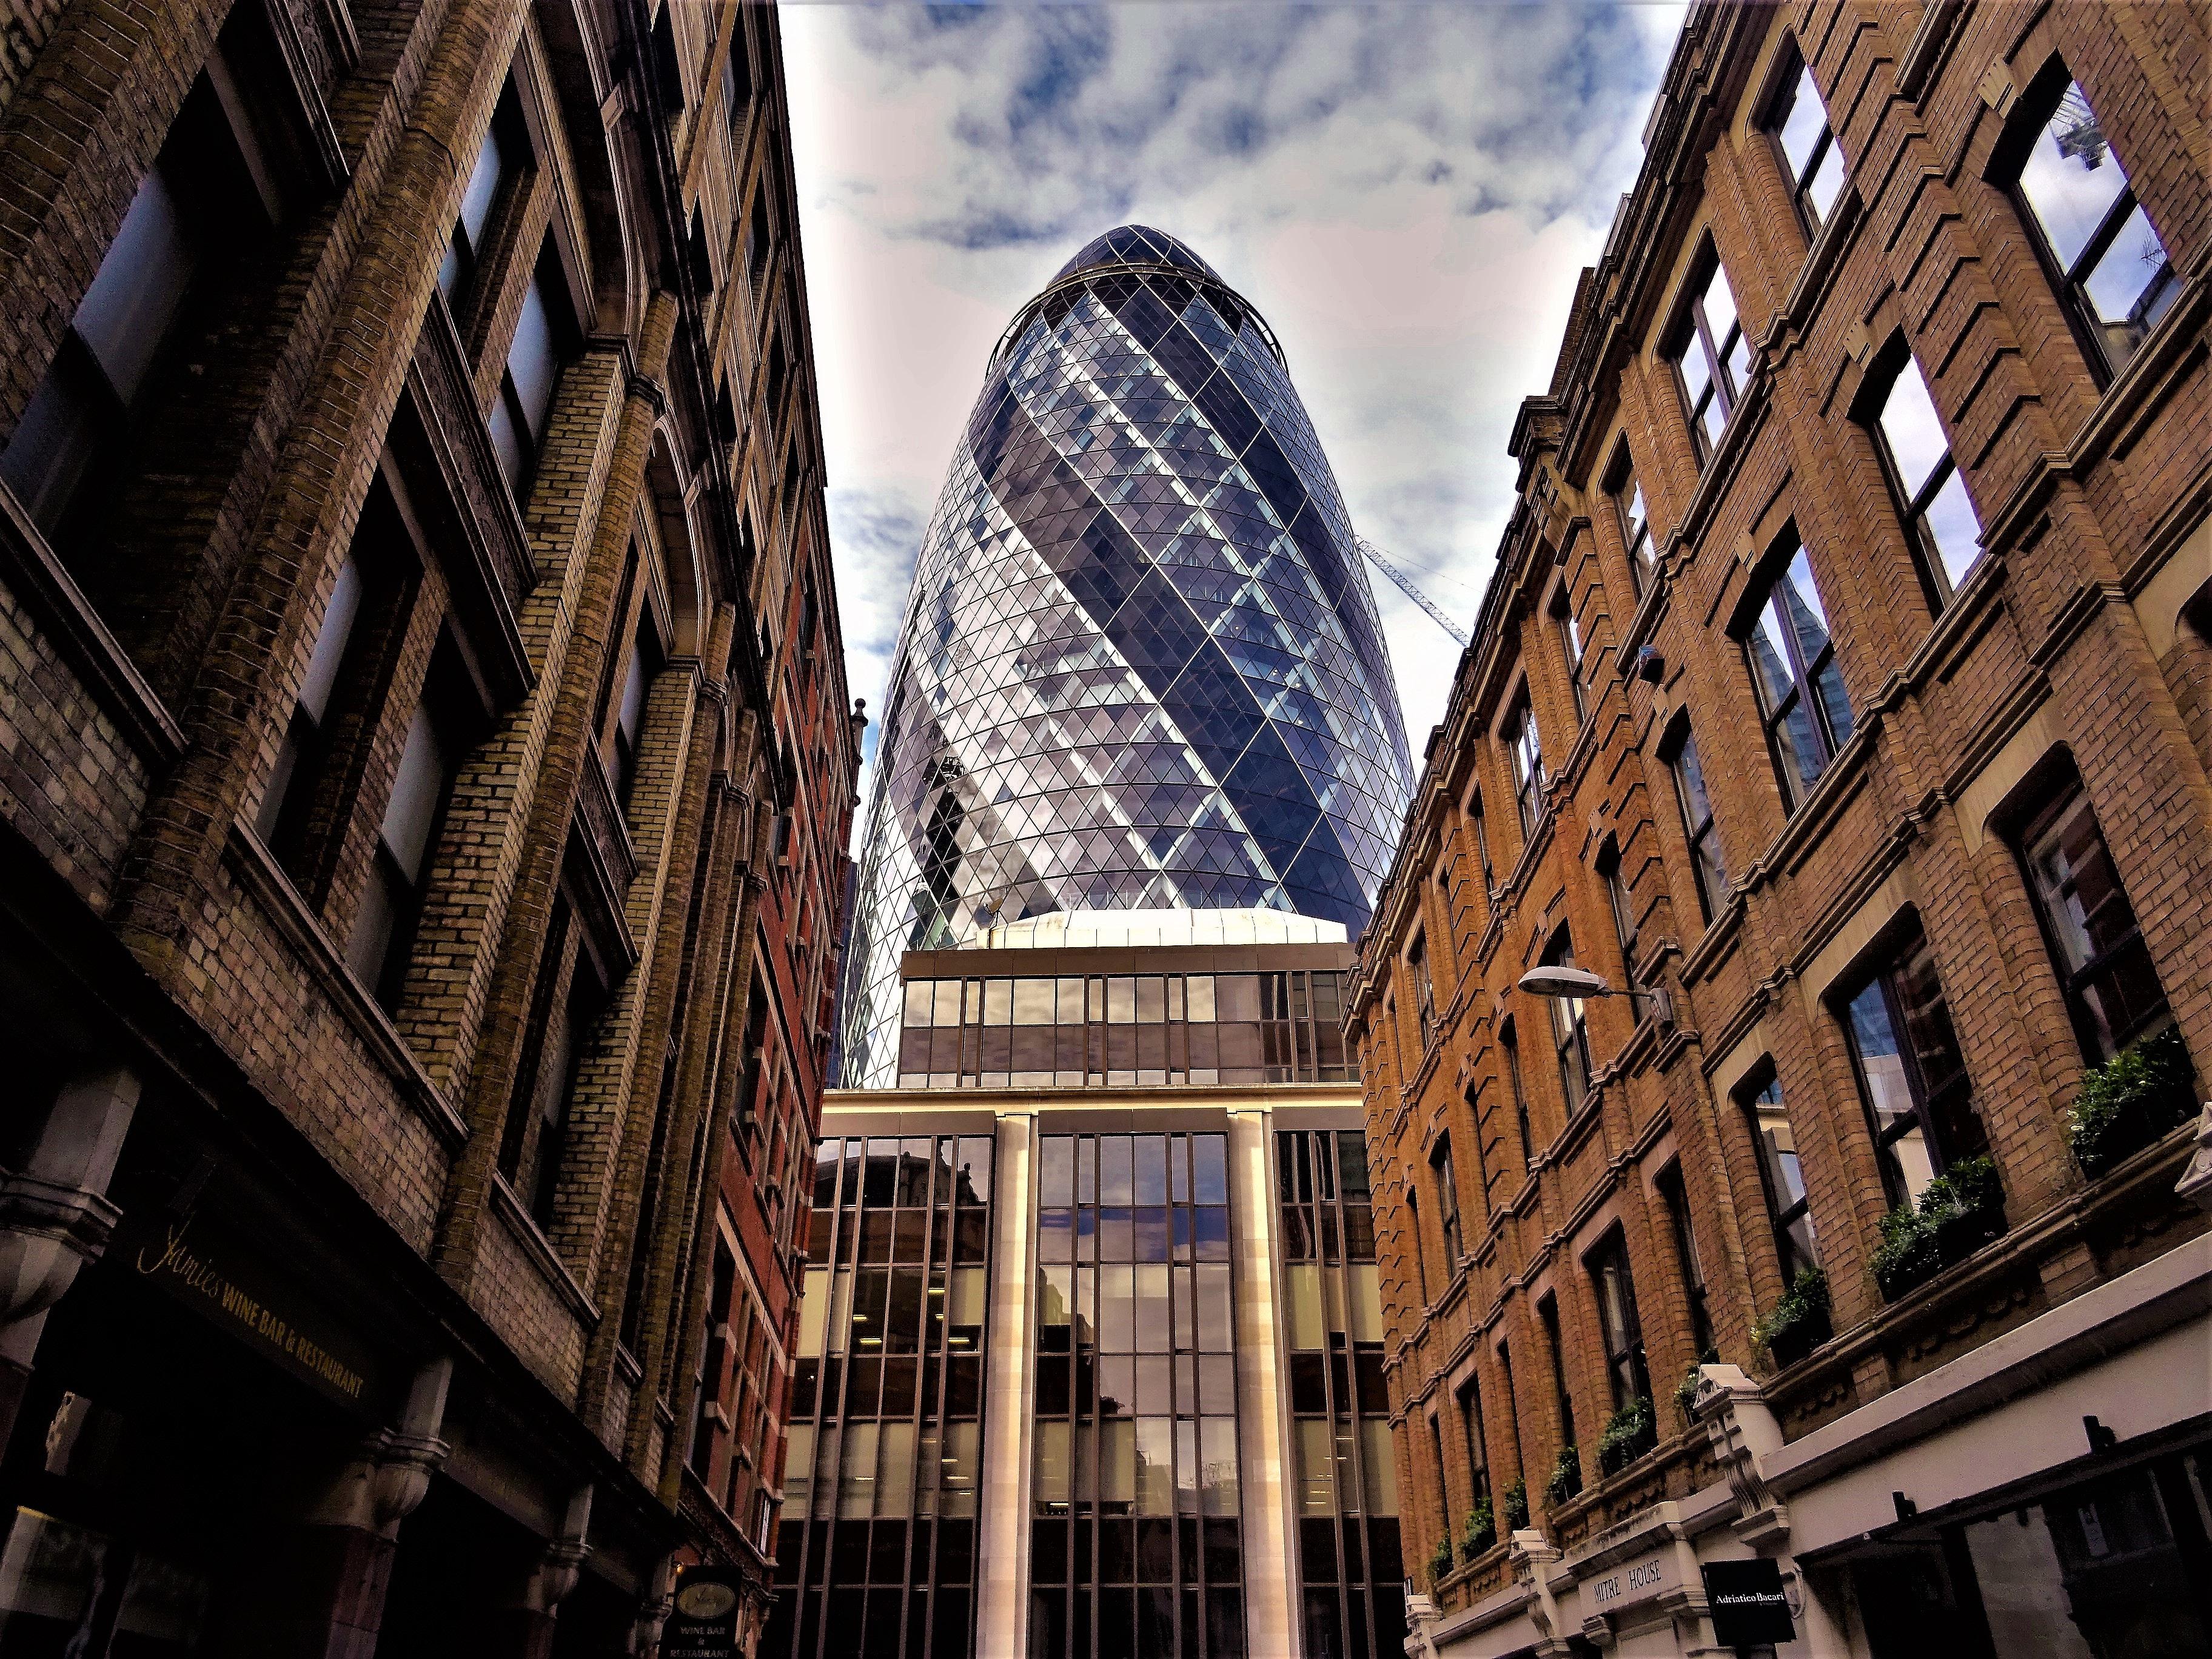 Low Angle Shot of Buildings, Glass windows, Windows, Urban, Travel, HQ Photo